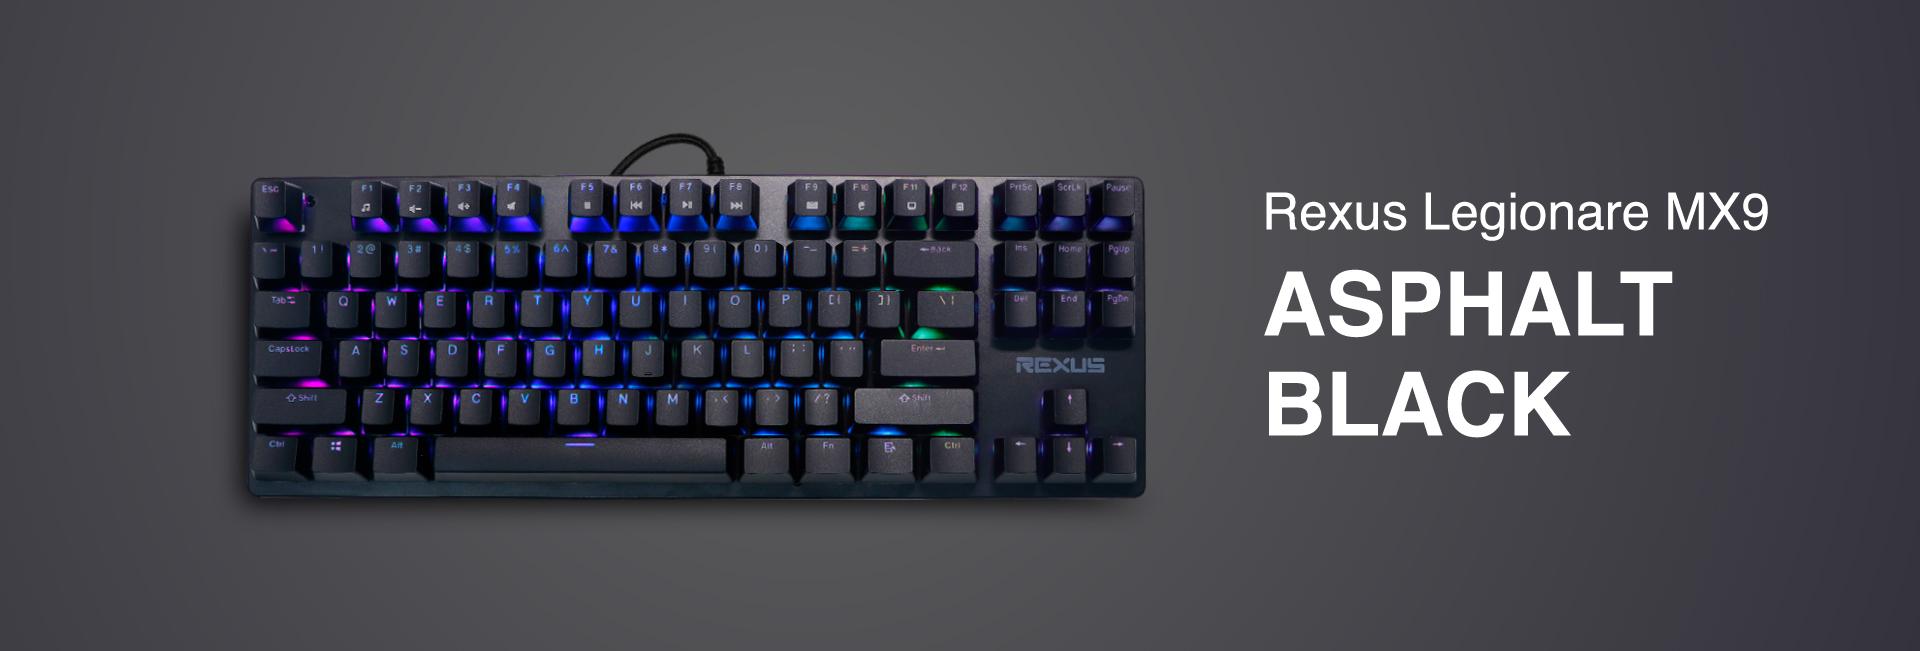 keyboard gaming Rexus Legionare MX9 WL MX9 06